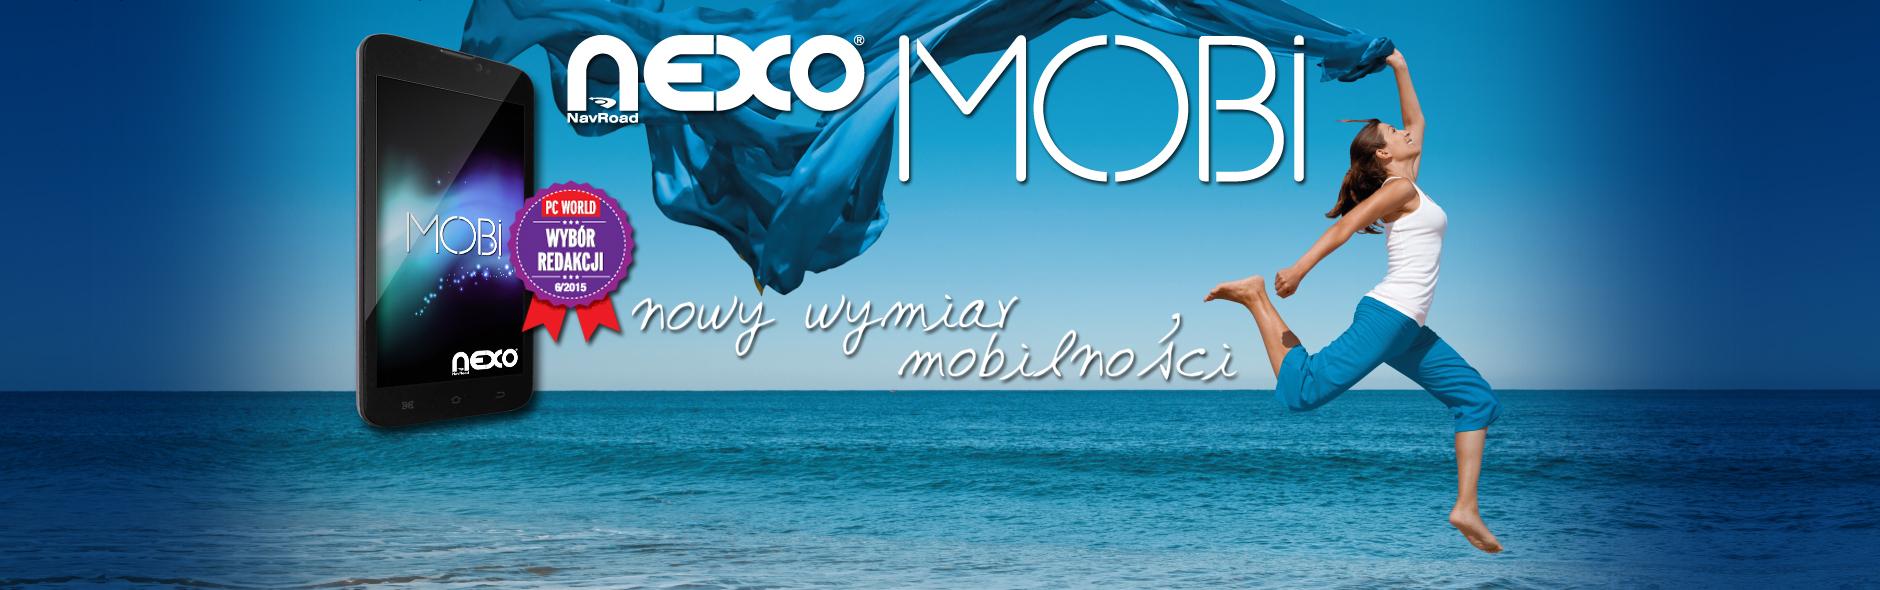 NEXO MOBI_banner_PCW wybor redakcji